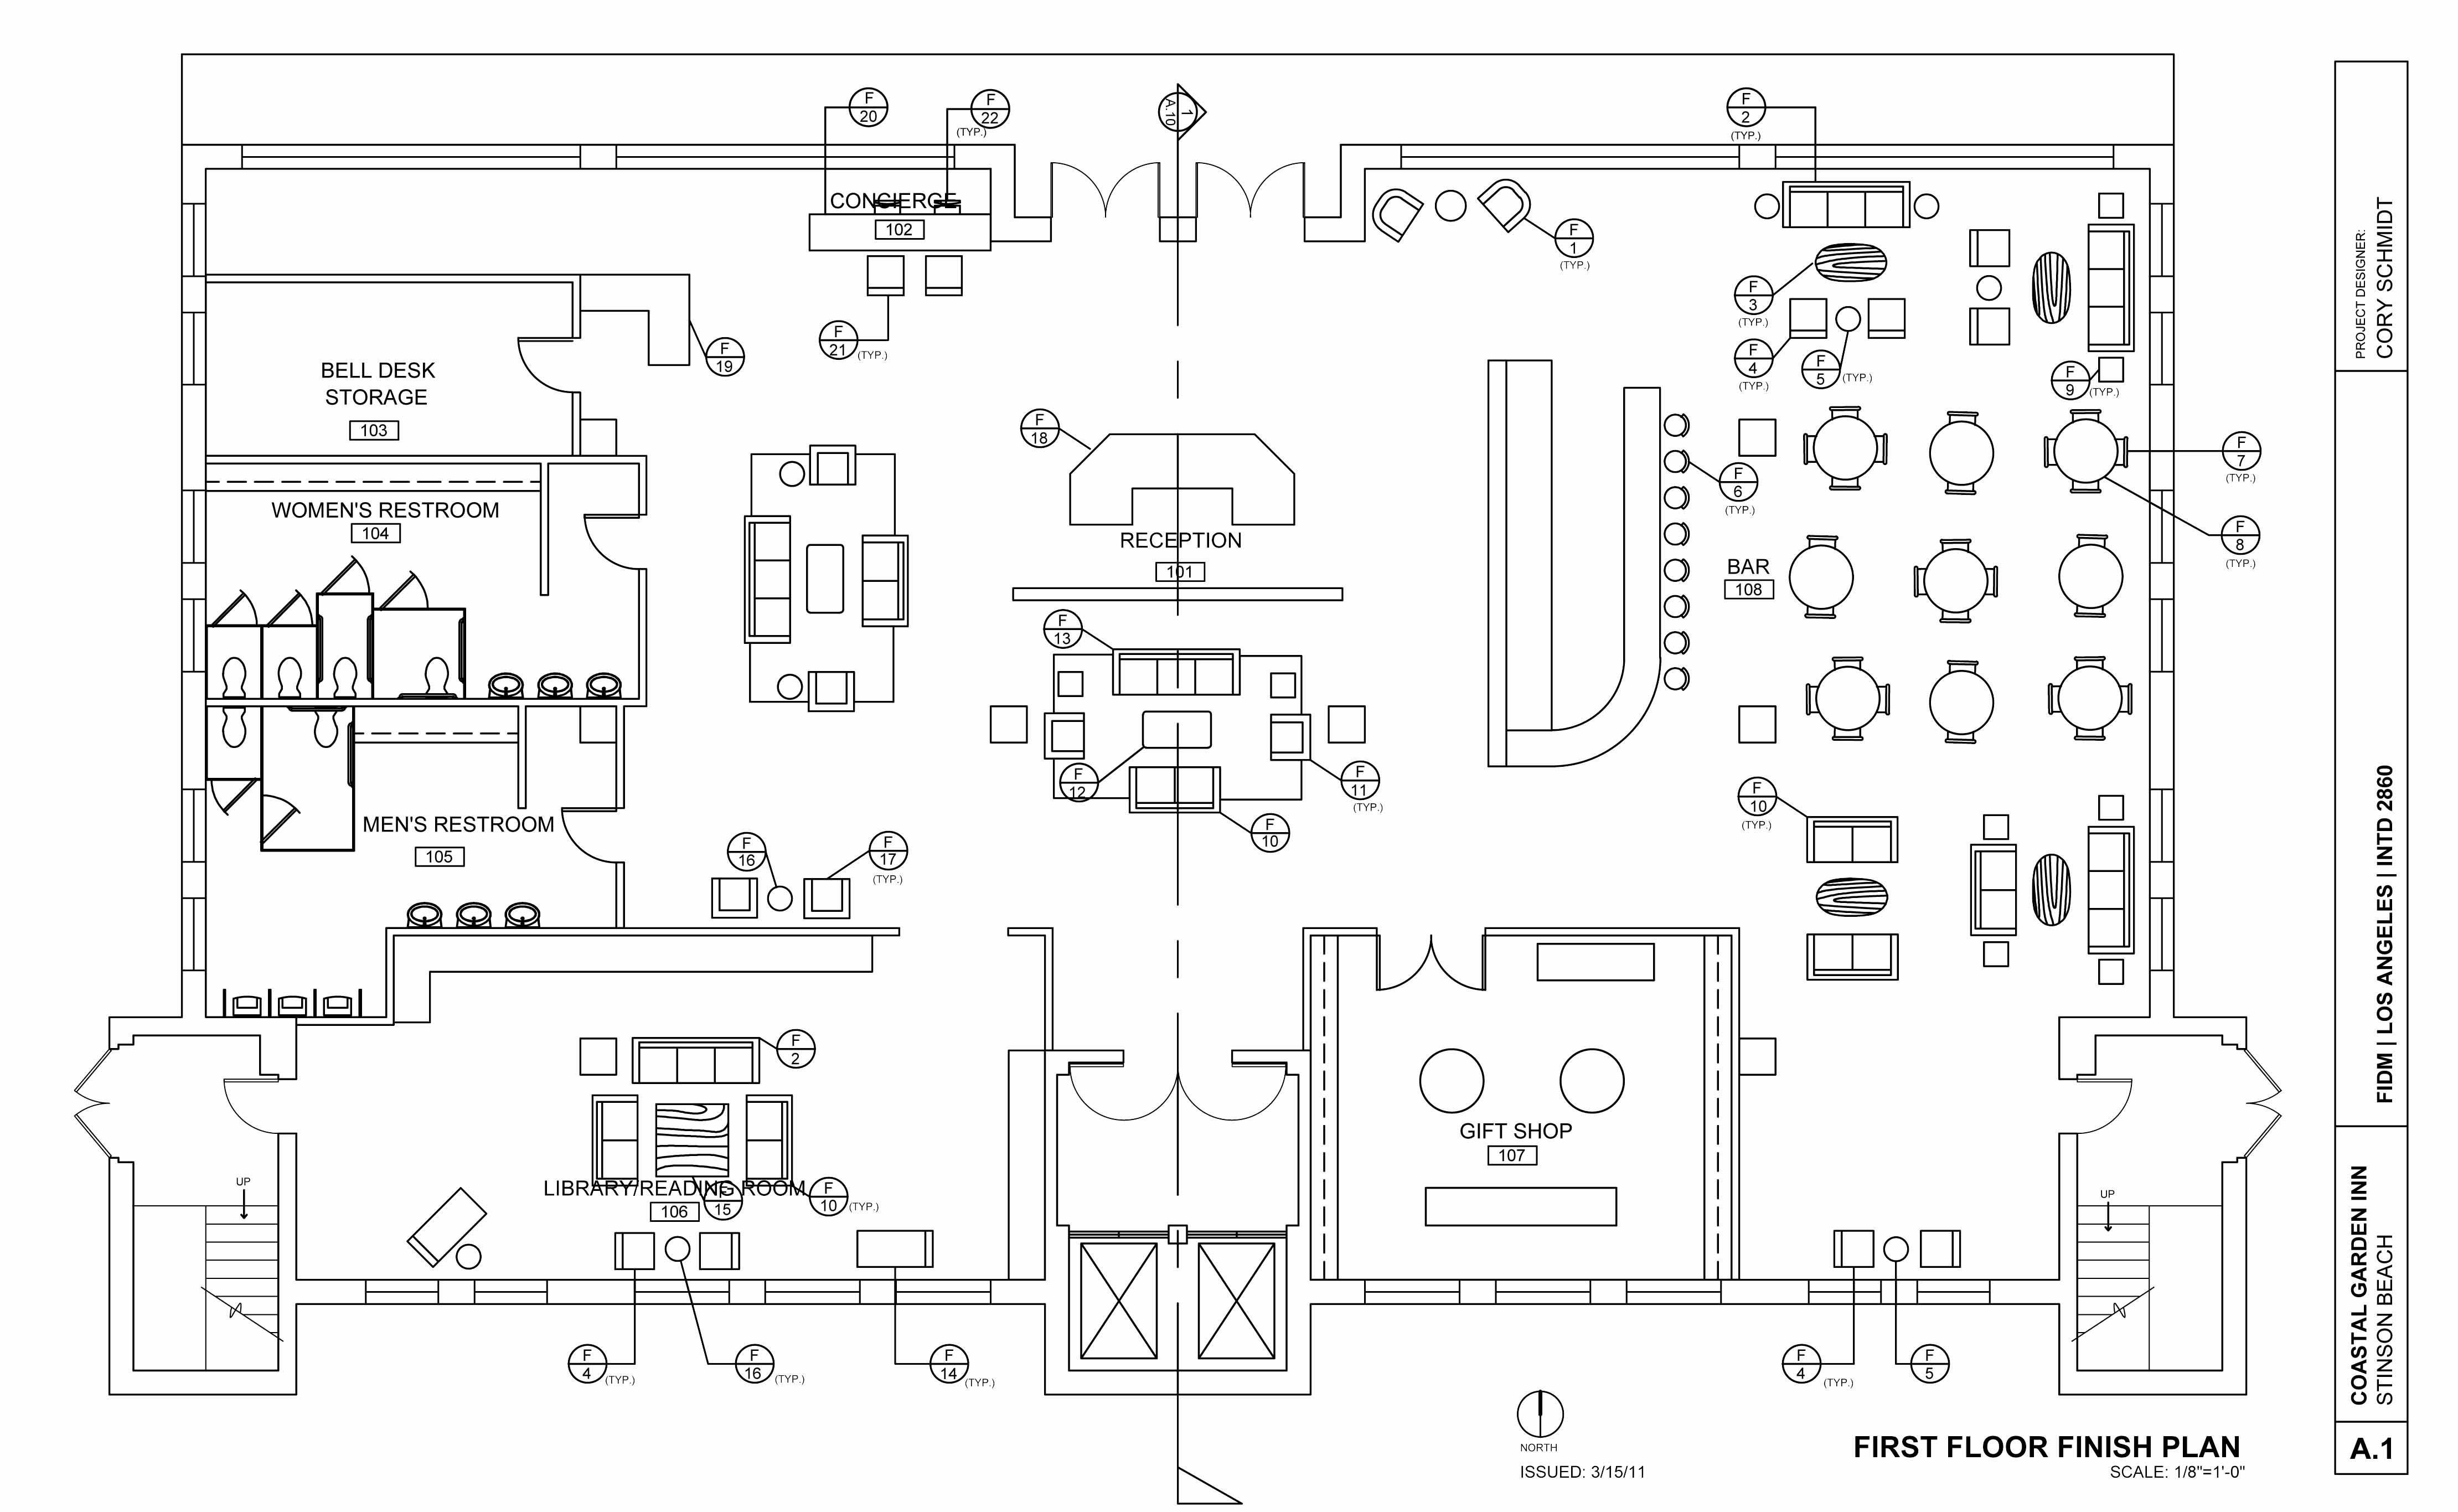 Hotel Design Development Drawings (AutoCAD)